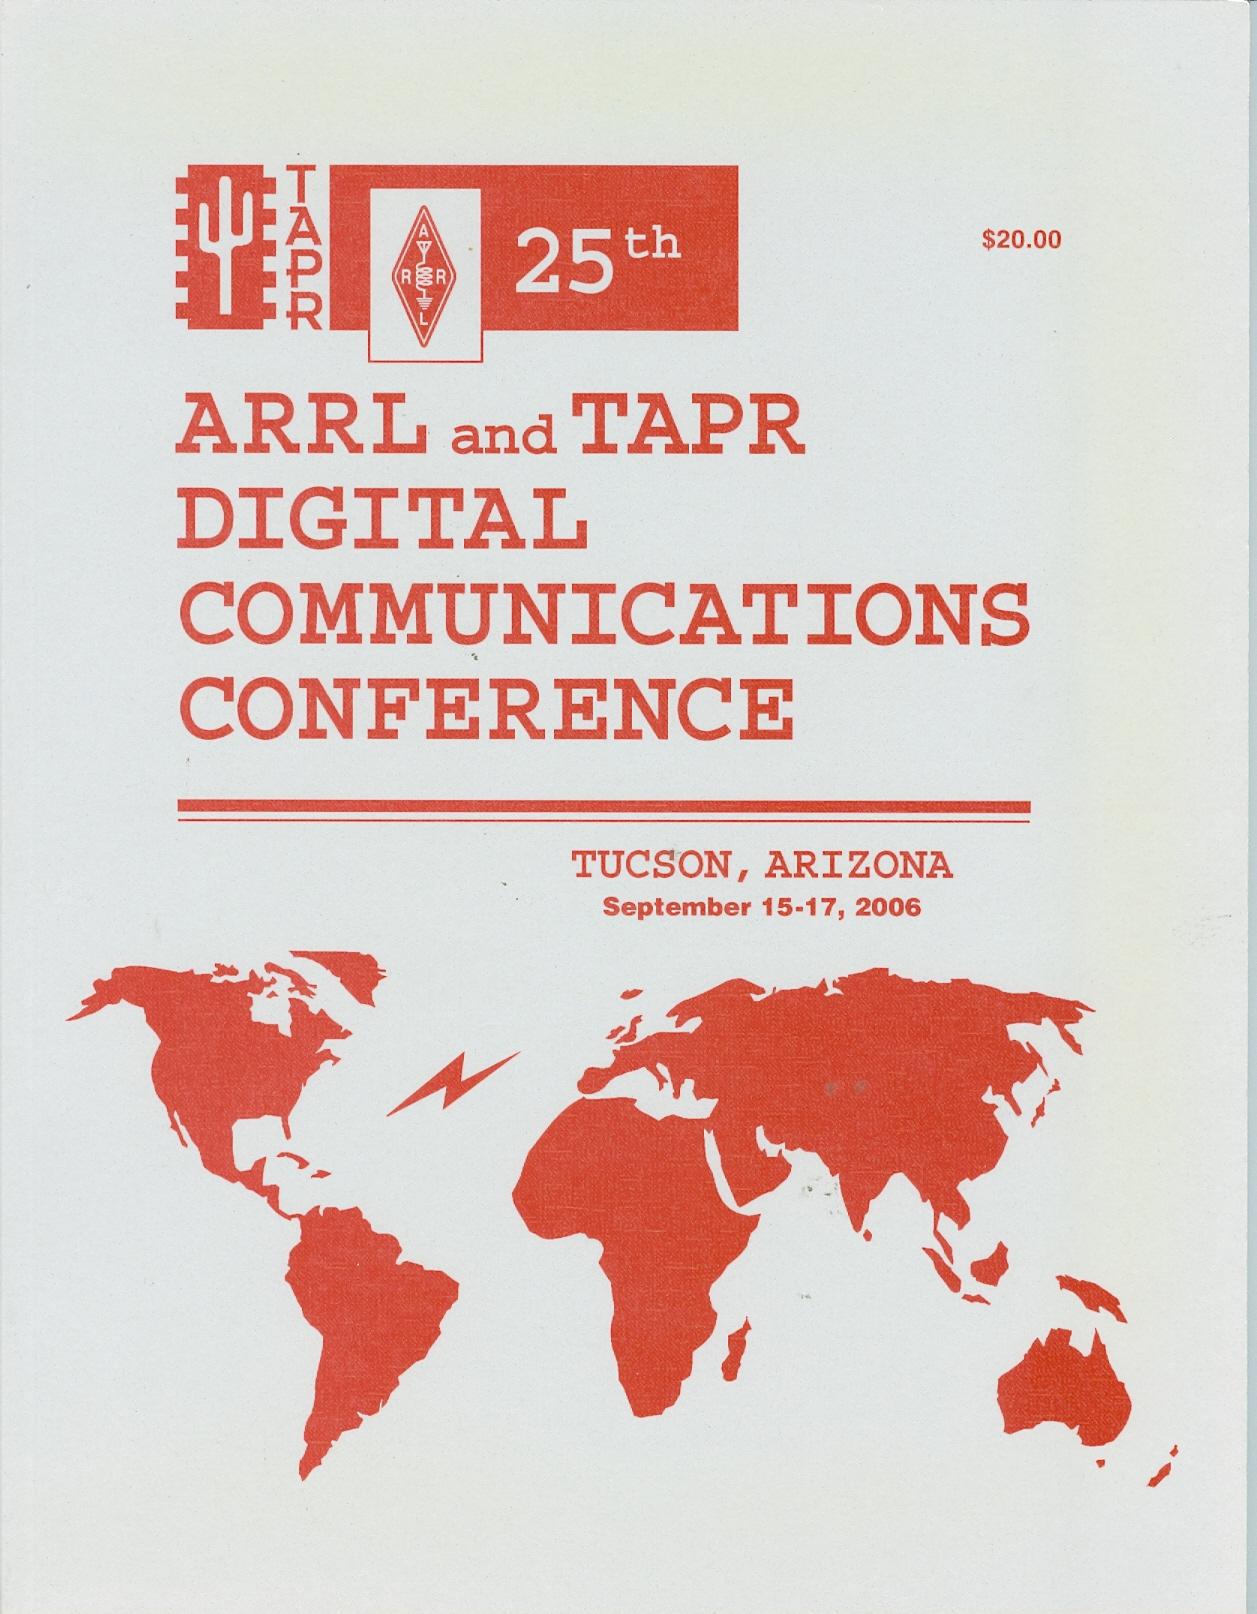 25th ARRL & TAPR Digital Communications Conference